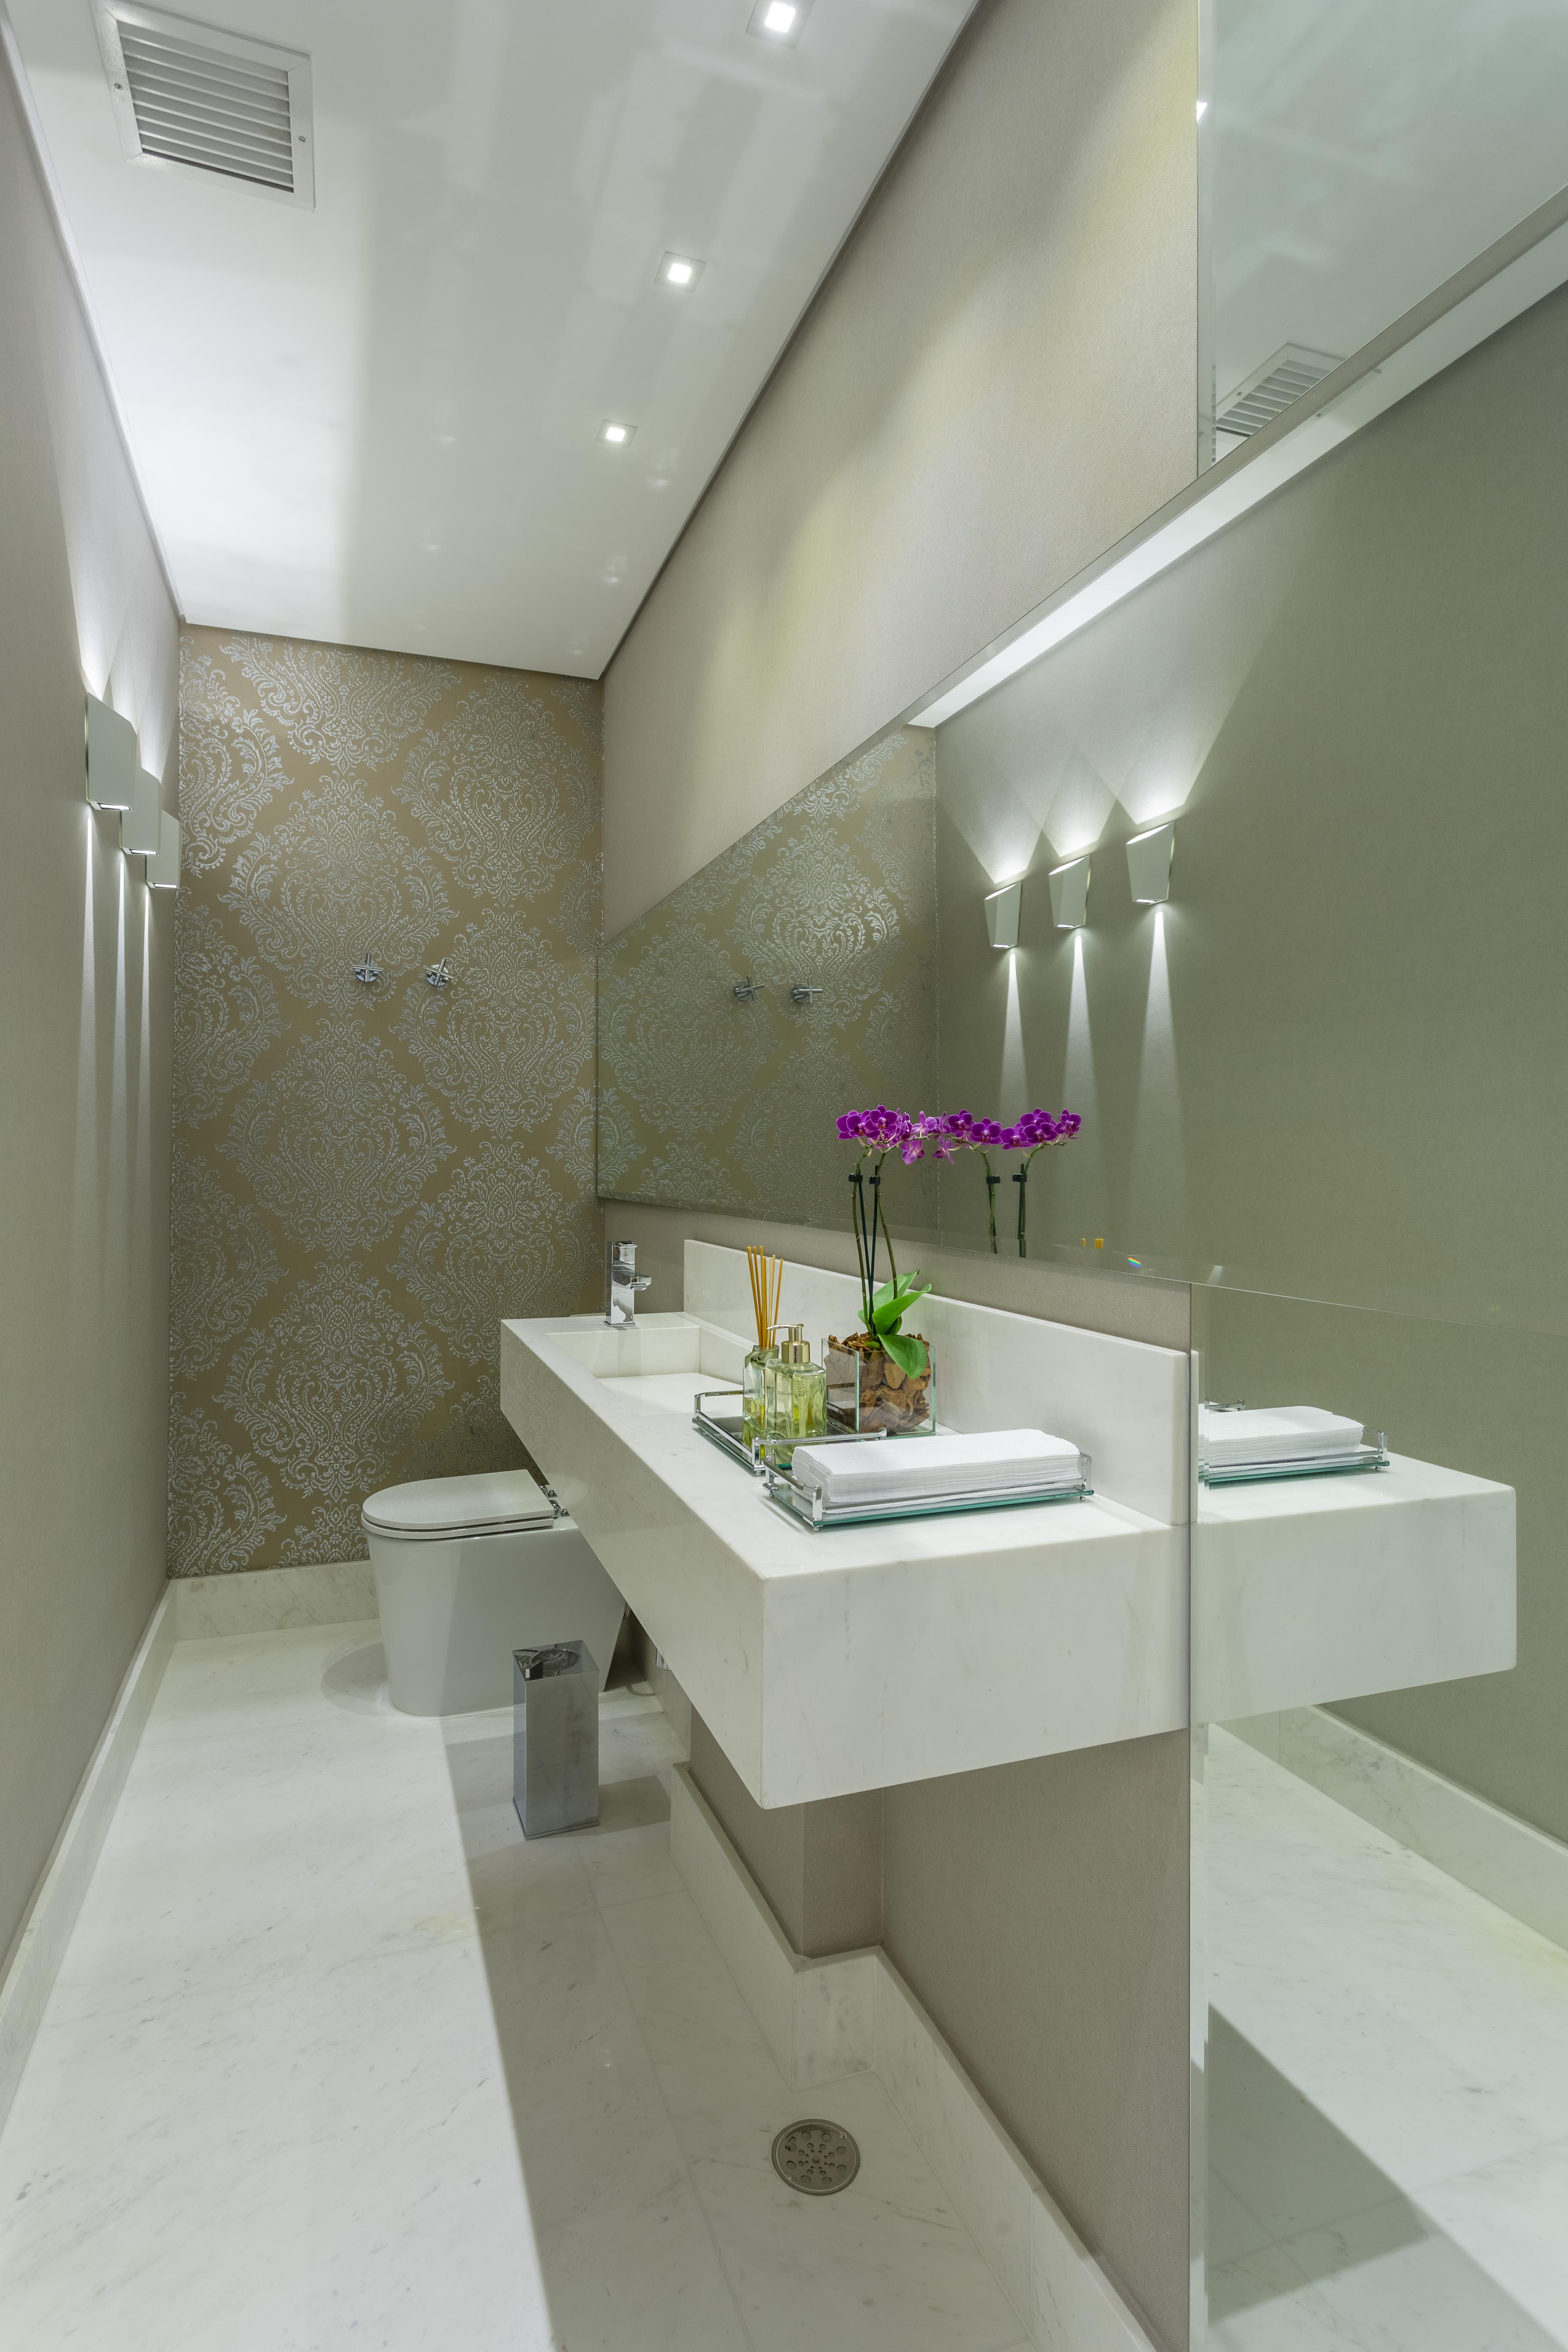 Lavabo com cores neutras e papel de parede